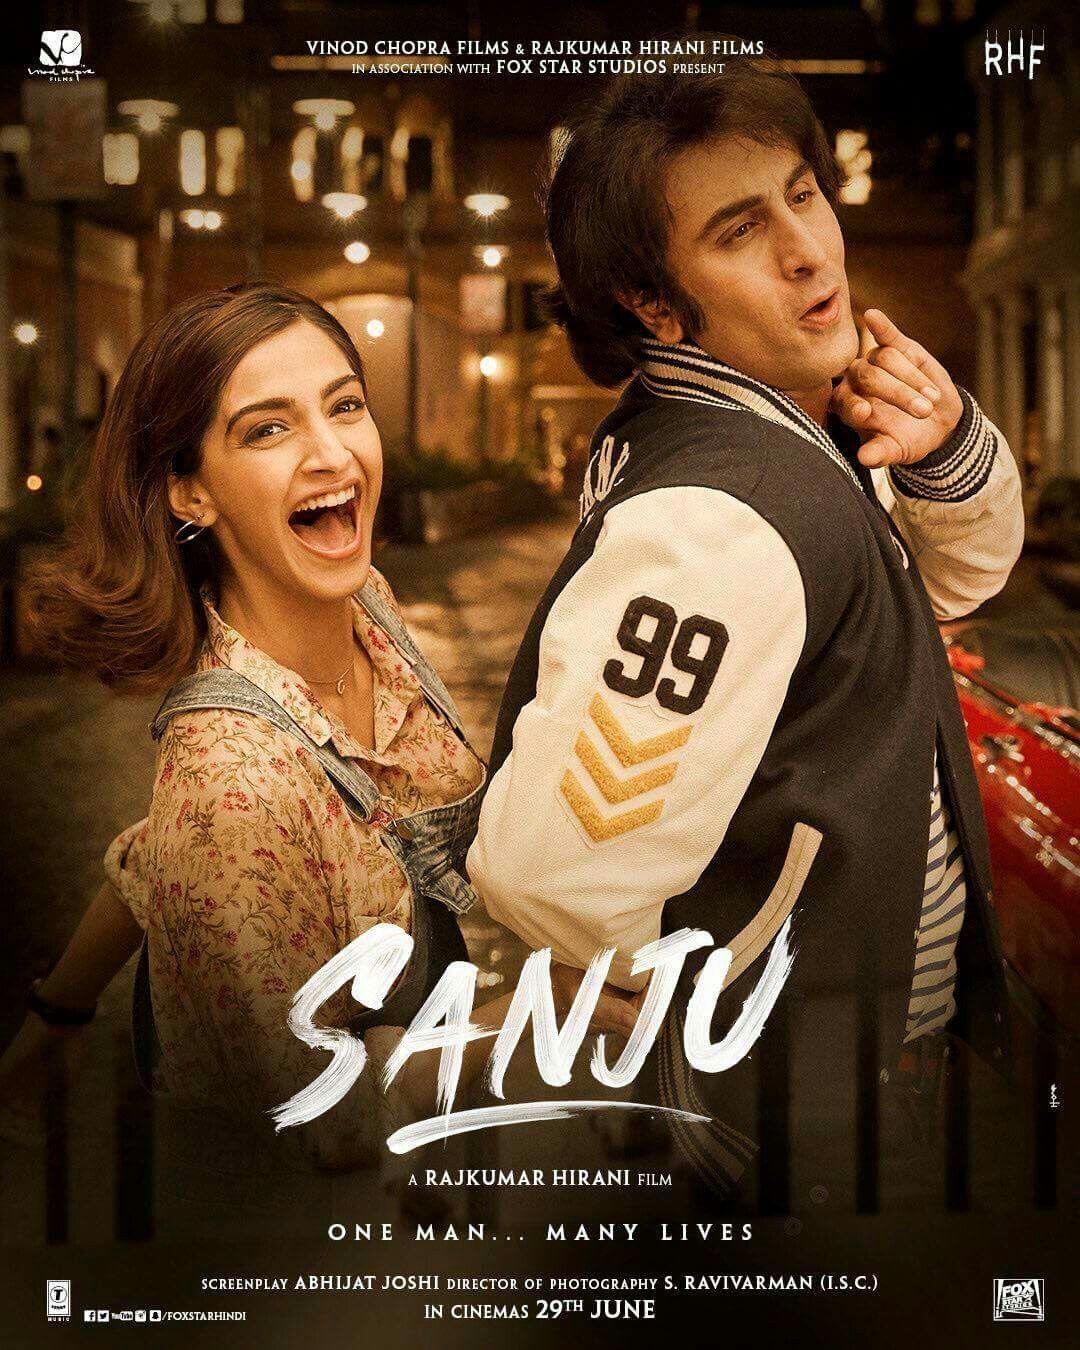 New poster of sanju -Ranbir kapoor with Sonam k Ahuja ...